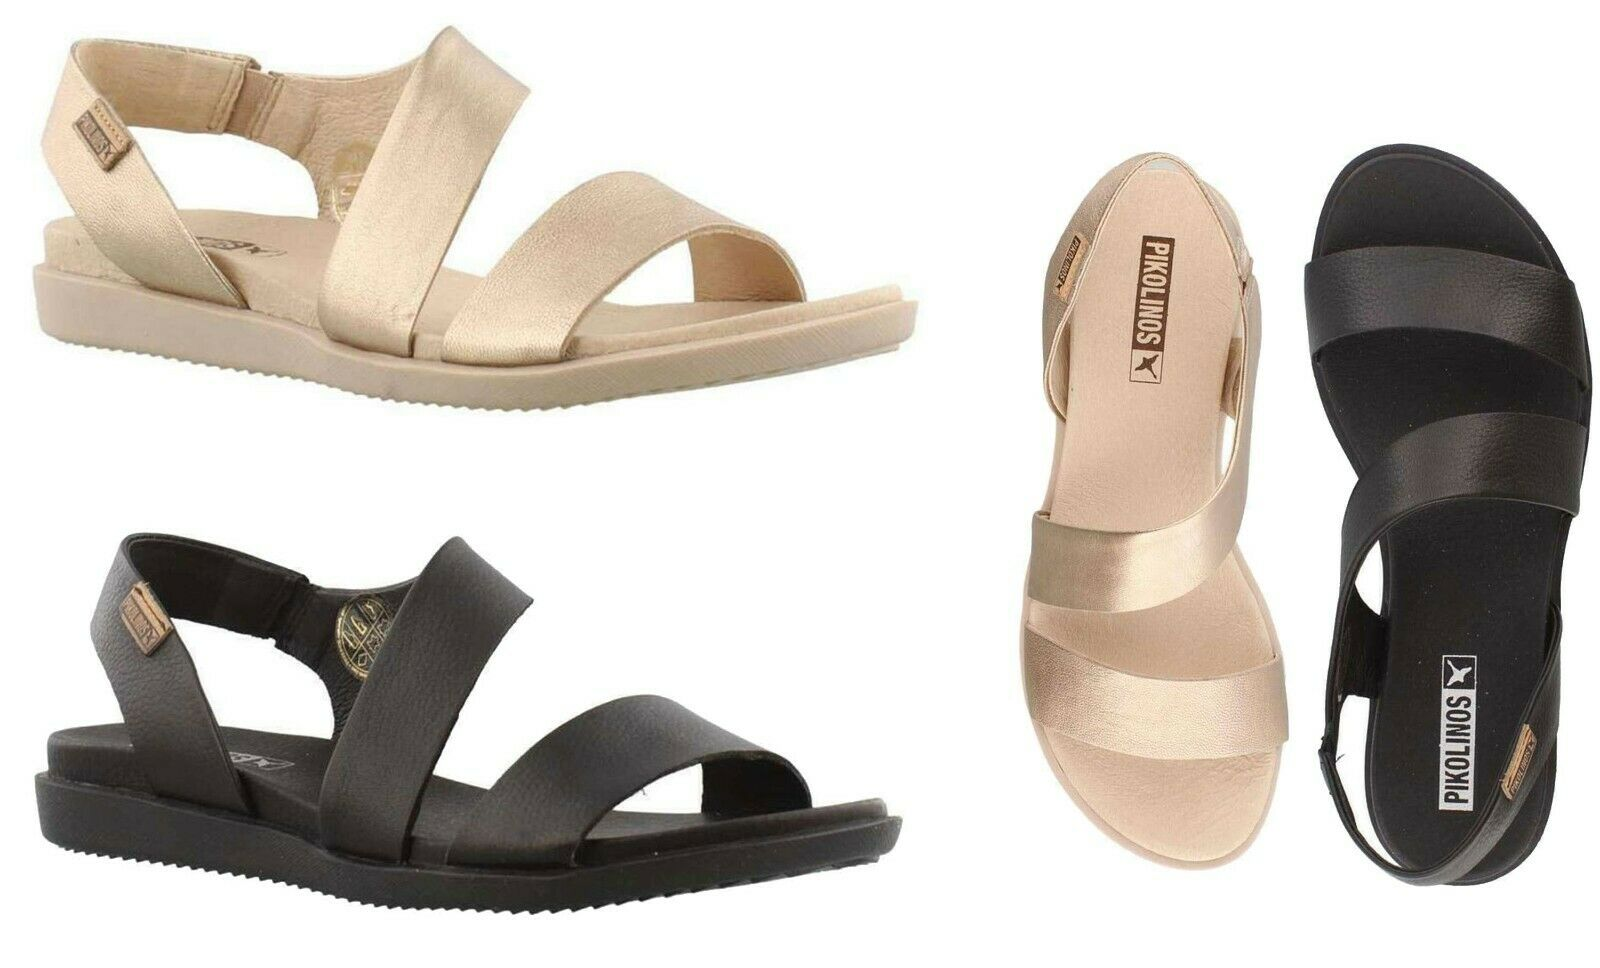 c045e77595dae NEW Pikolinos Women's Antillas Leather Open Toe Comfort Sandals ...